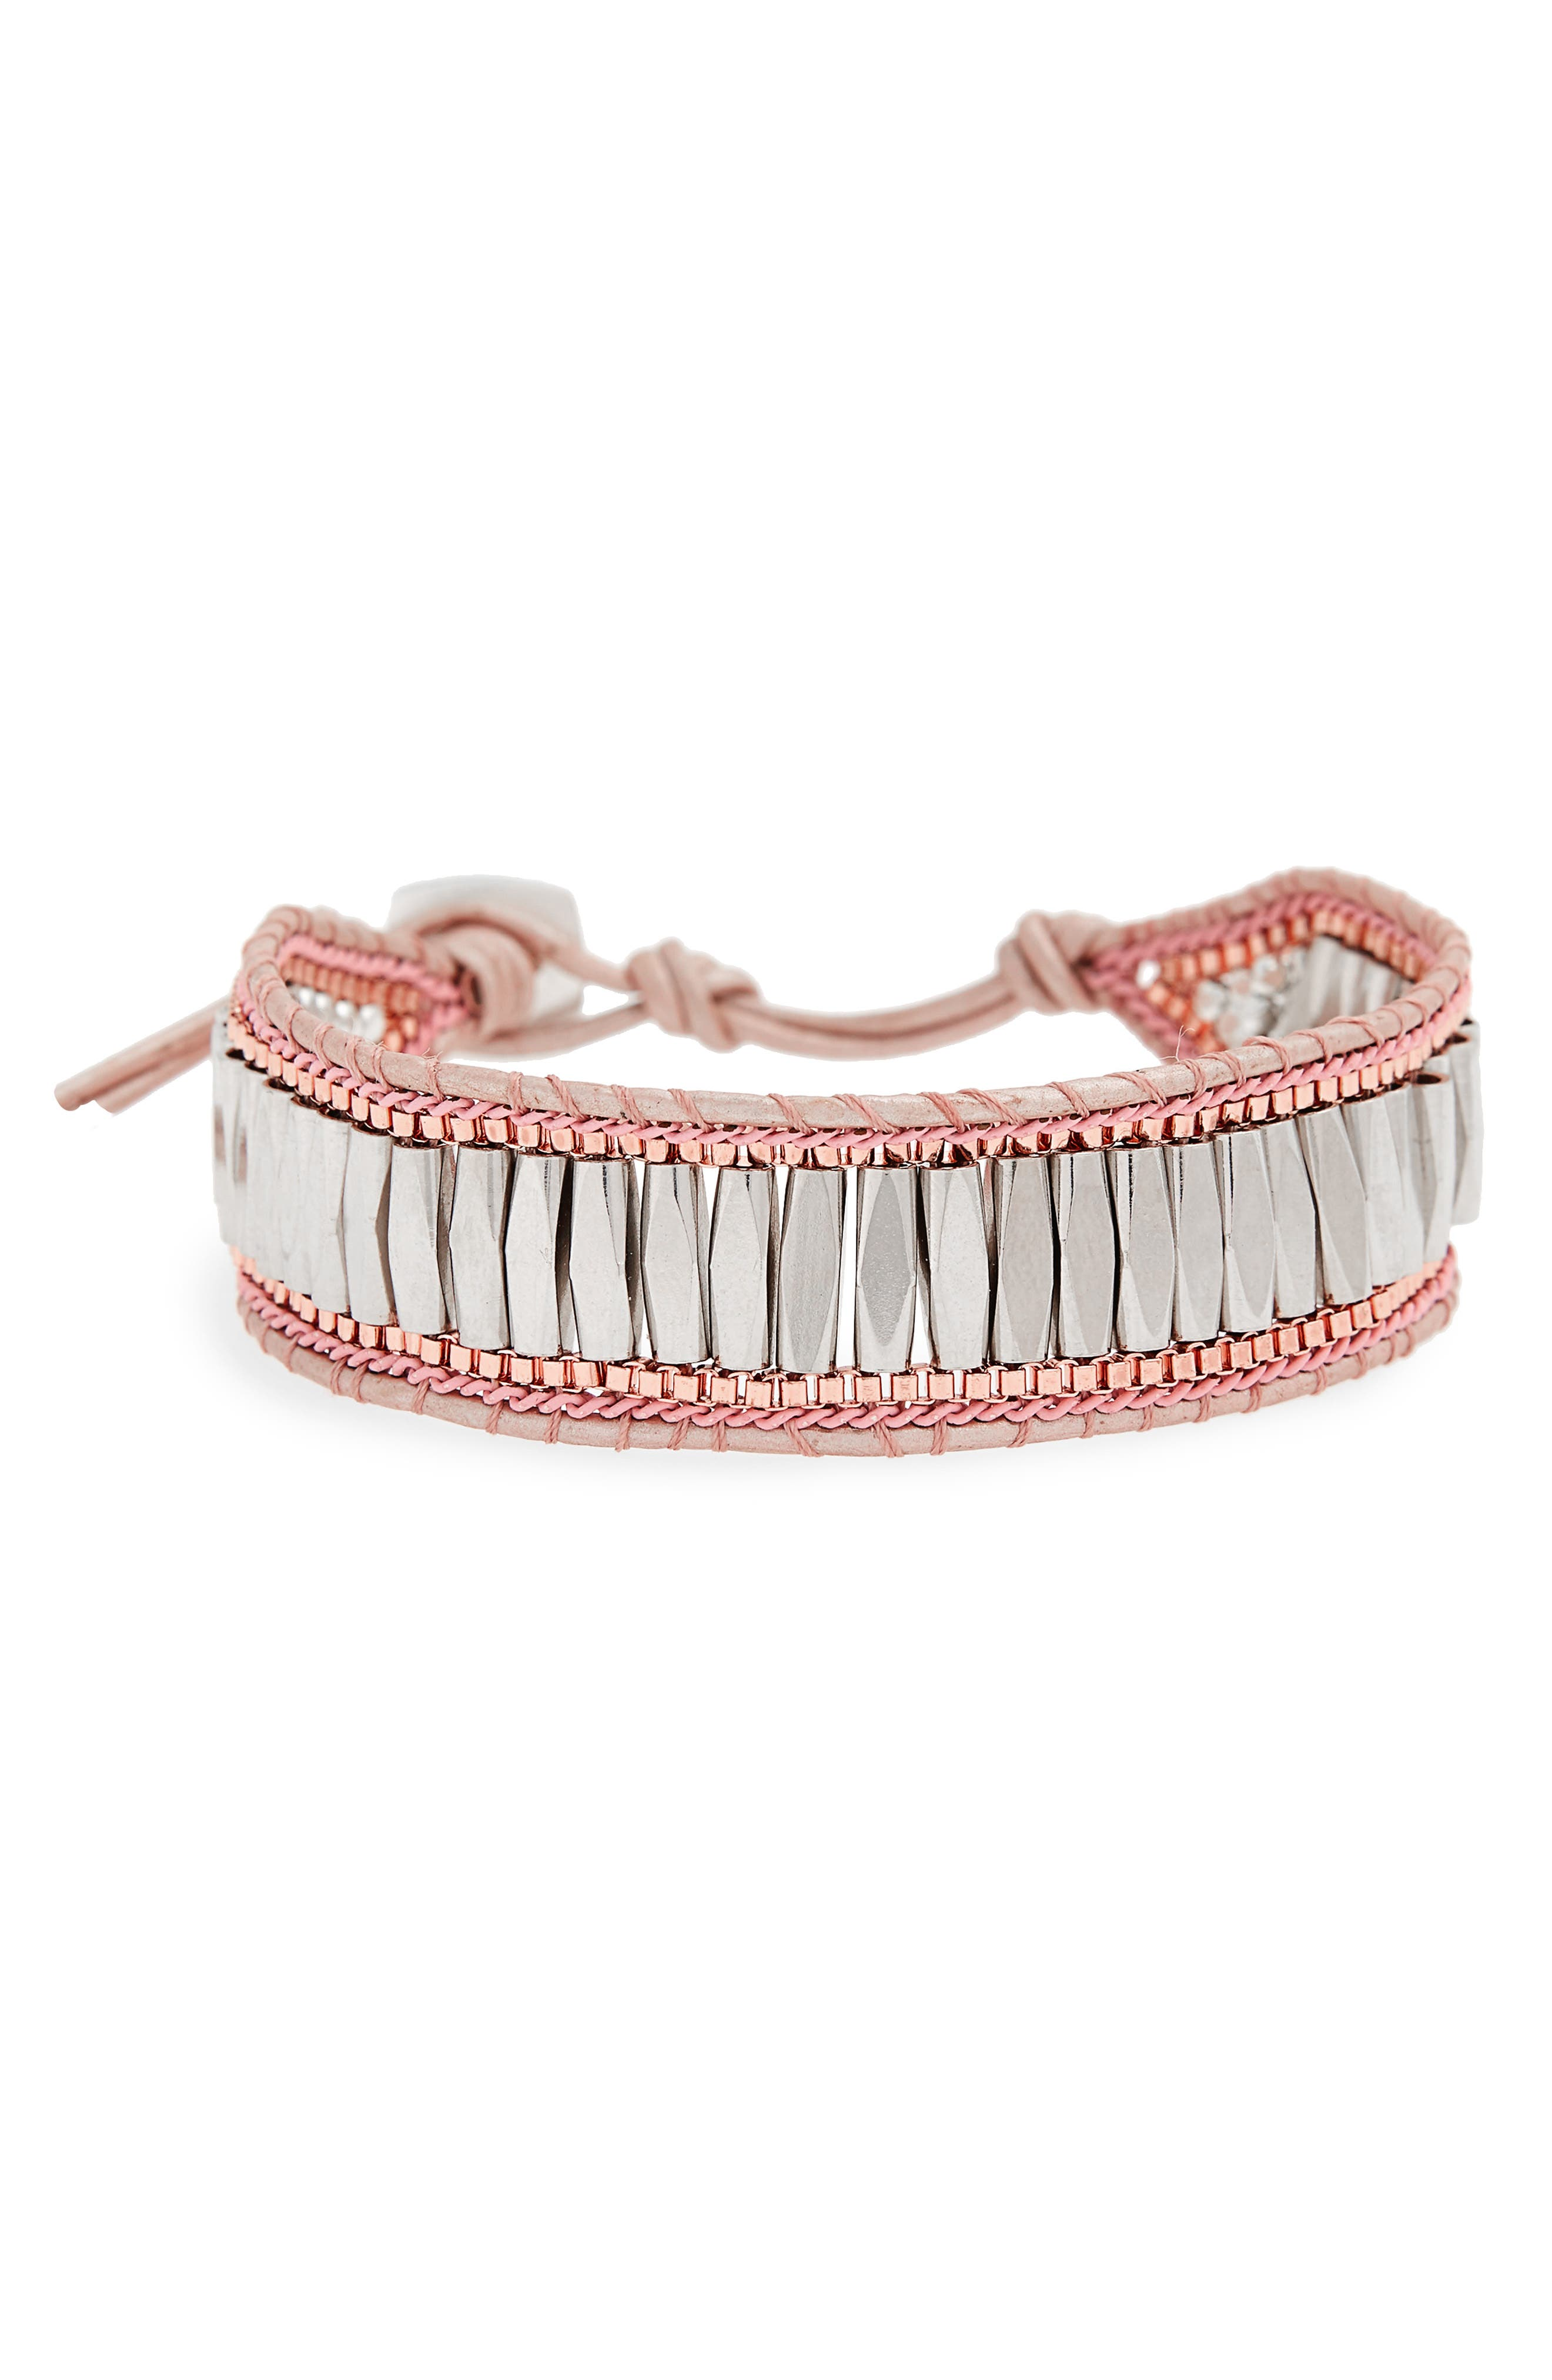 Beaded Leather Bracelet,                         Main,                         color,